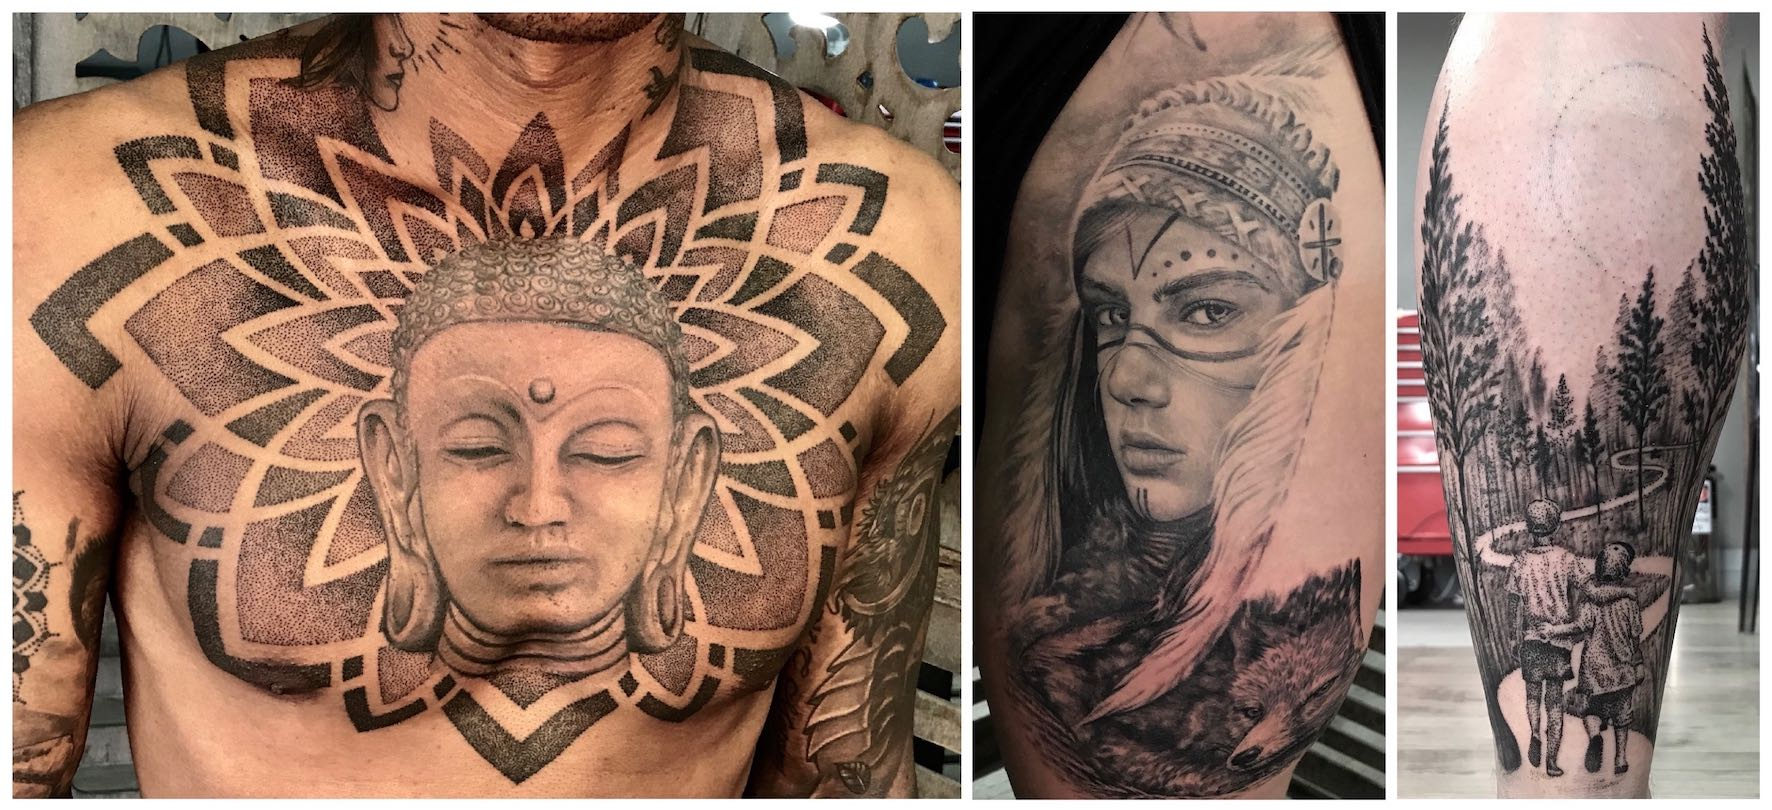 pattern and realism tattoo work done by John Martin Viljoen